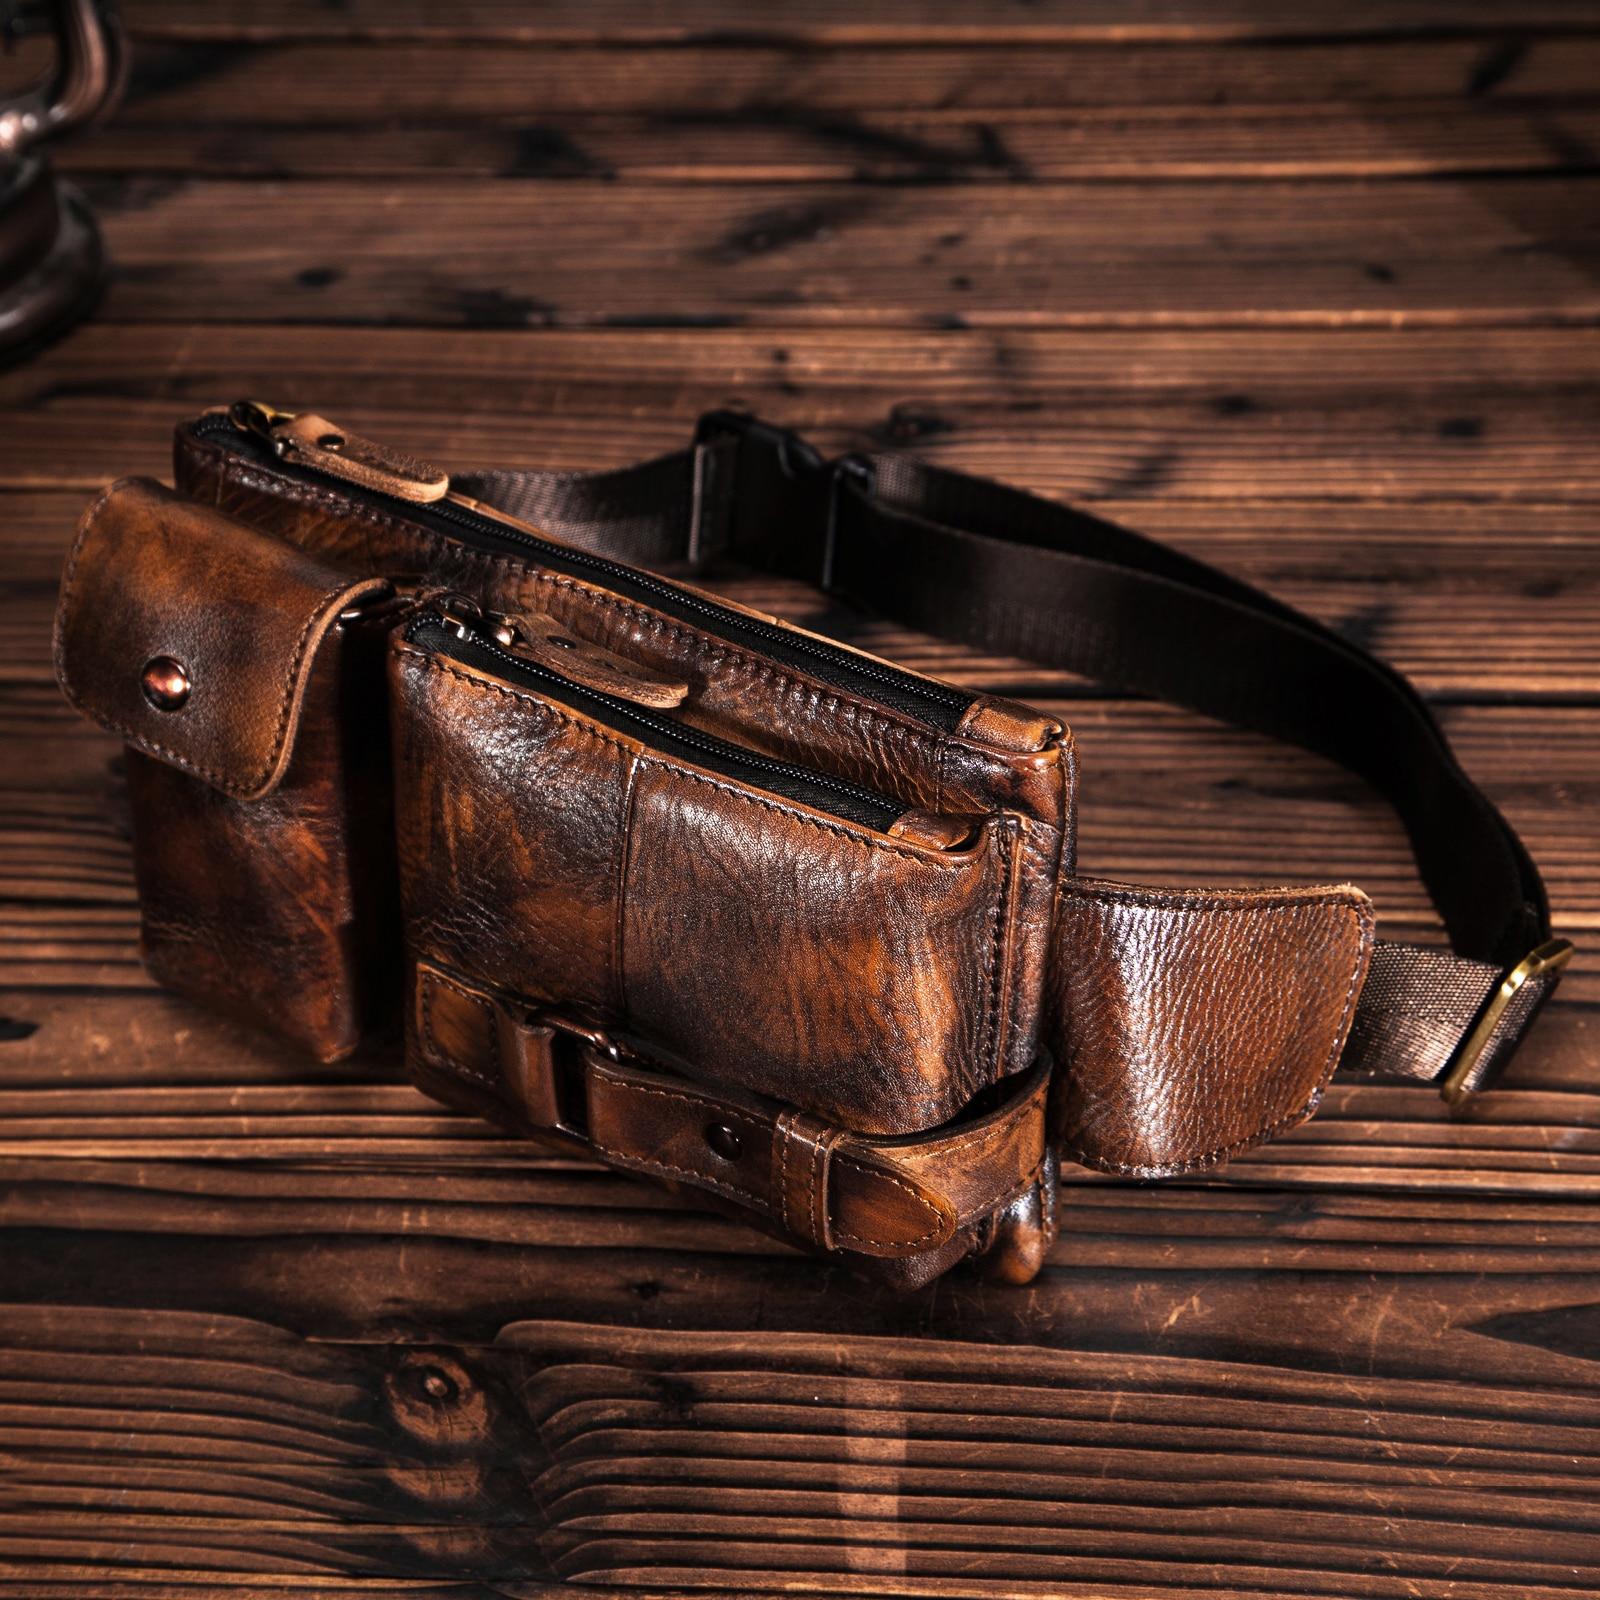 Original Leather Men Casual Fashion Travel Fanny Waist Belt Bag Chest Pack Sling Bag Design Bum Phone Case Pouch Male 8135-G